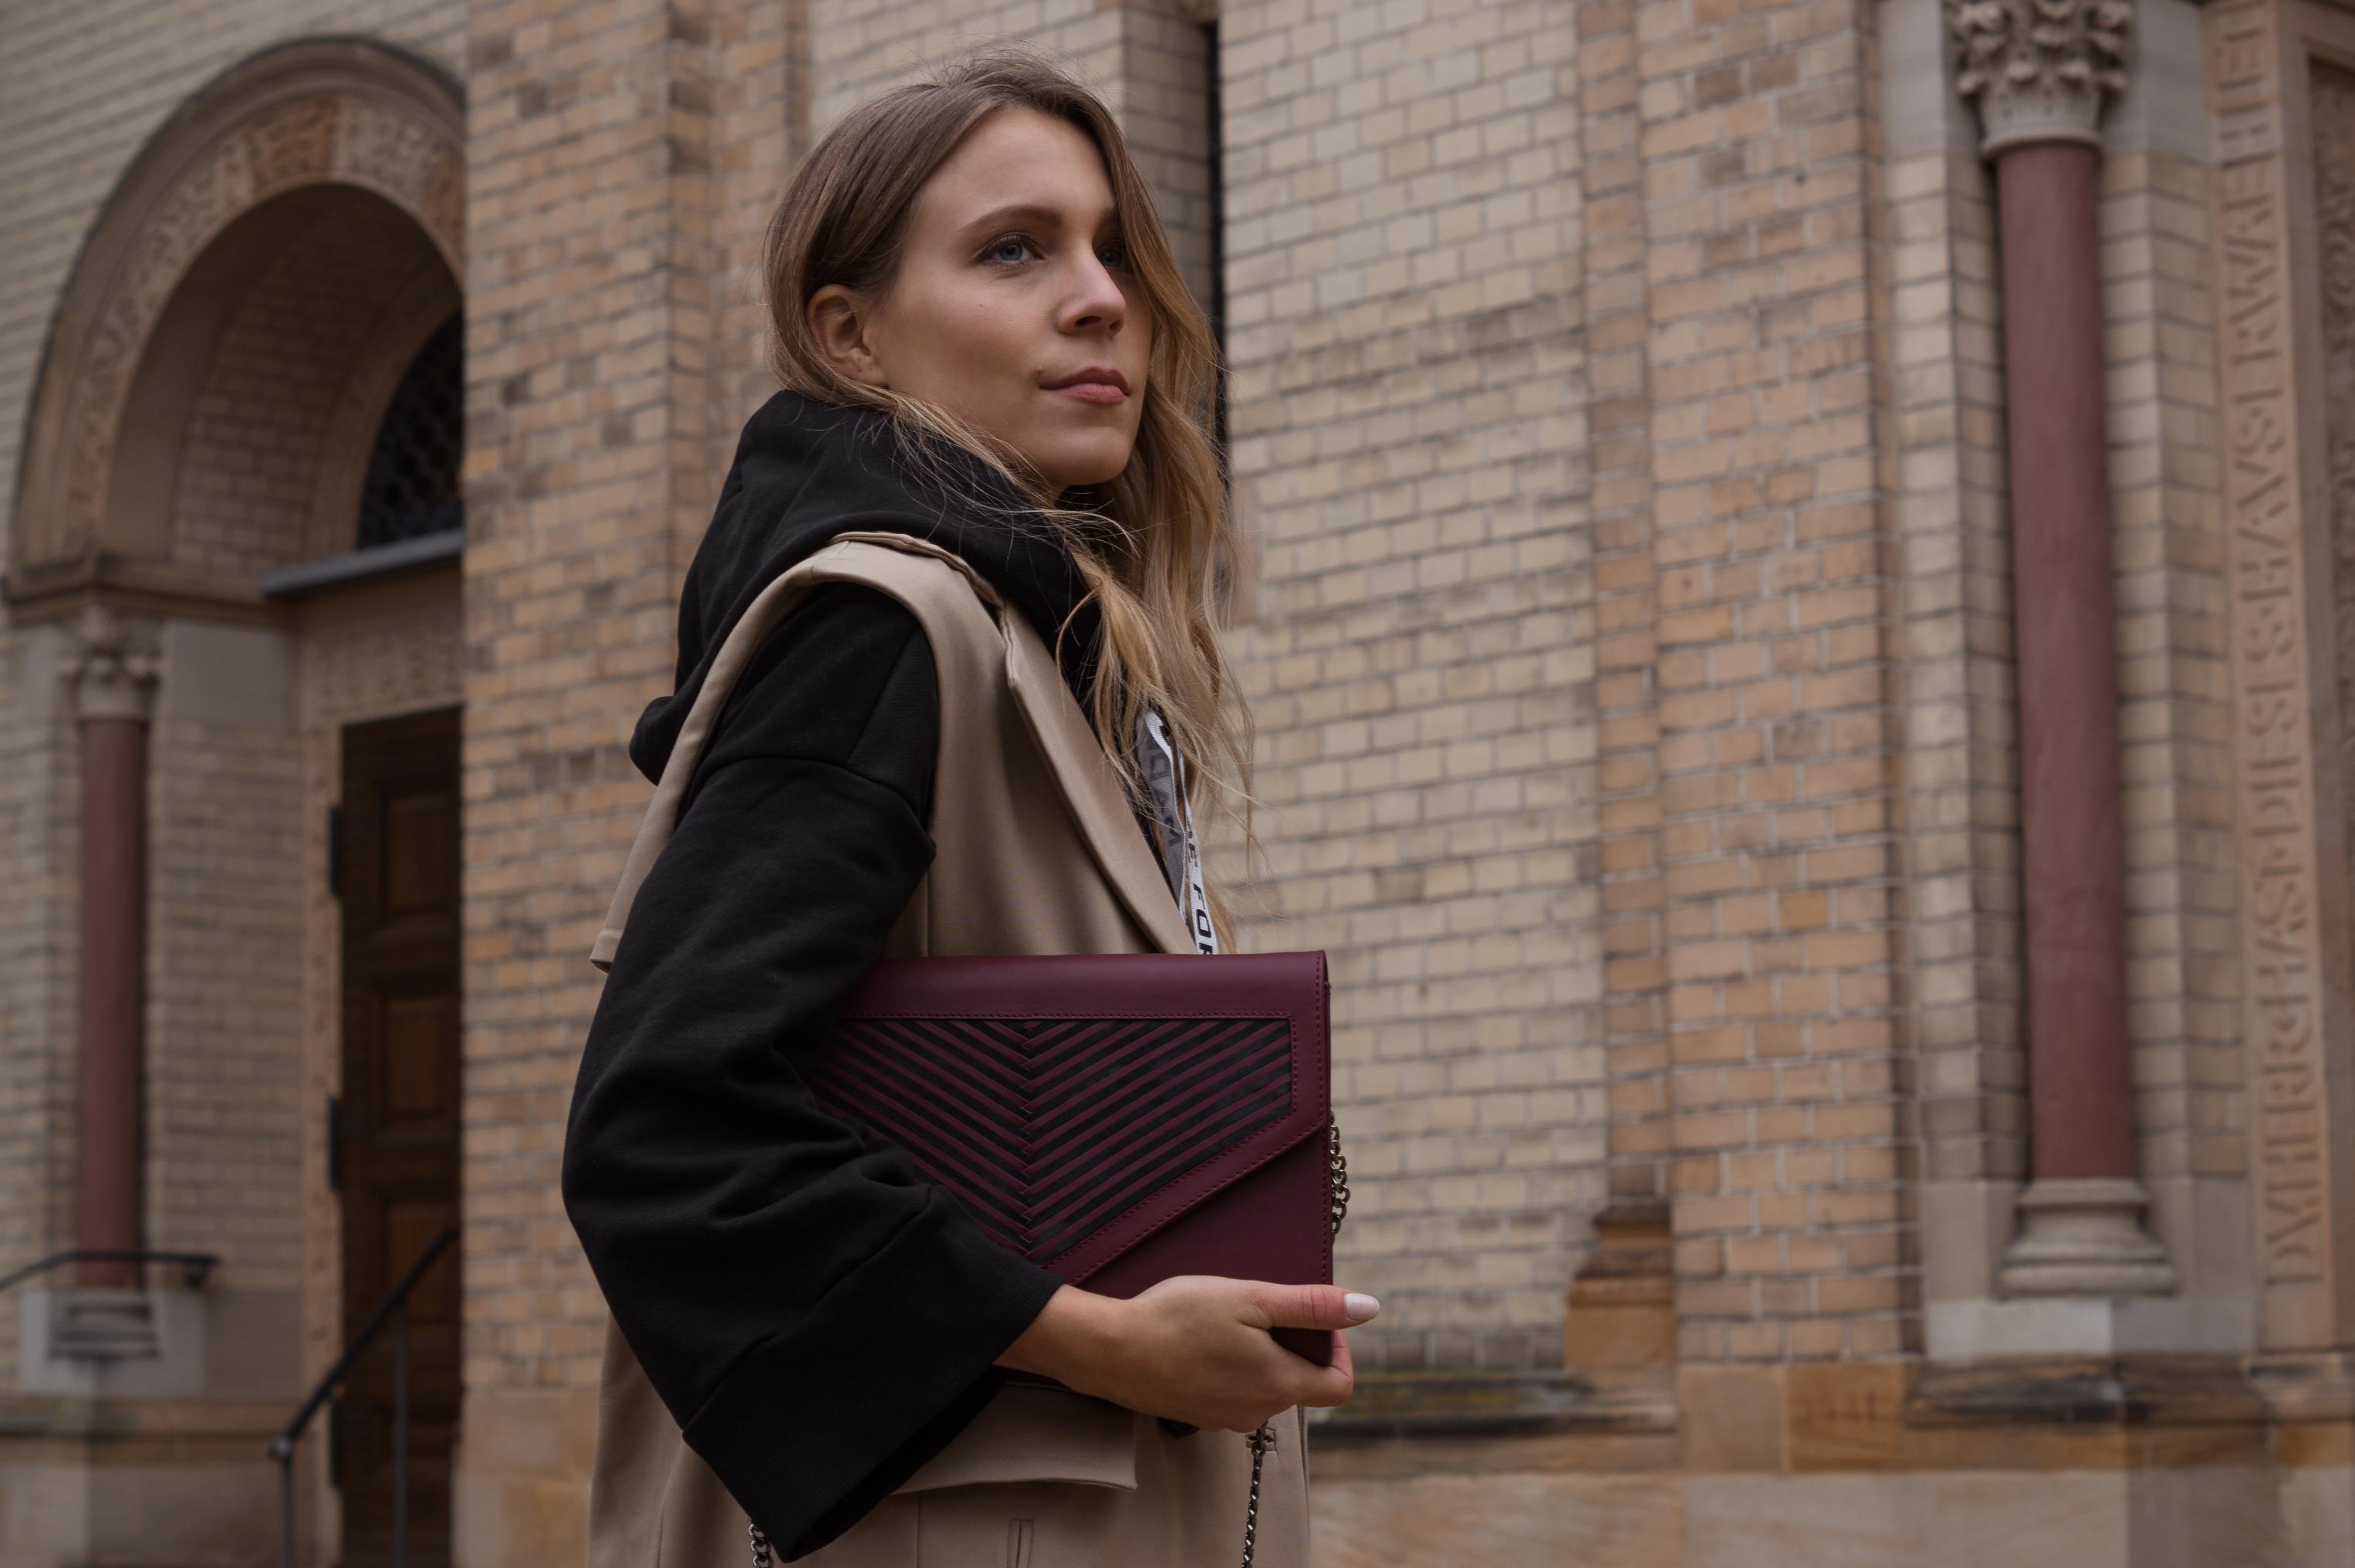 Zara Hoodie Trench Vest Lili Radu Bag Fashionblogger Sariety Modeblog Heidelberg Fall Layers karierte Hose Mango Streetstyle_4